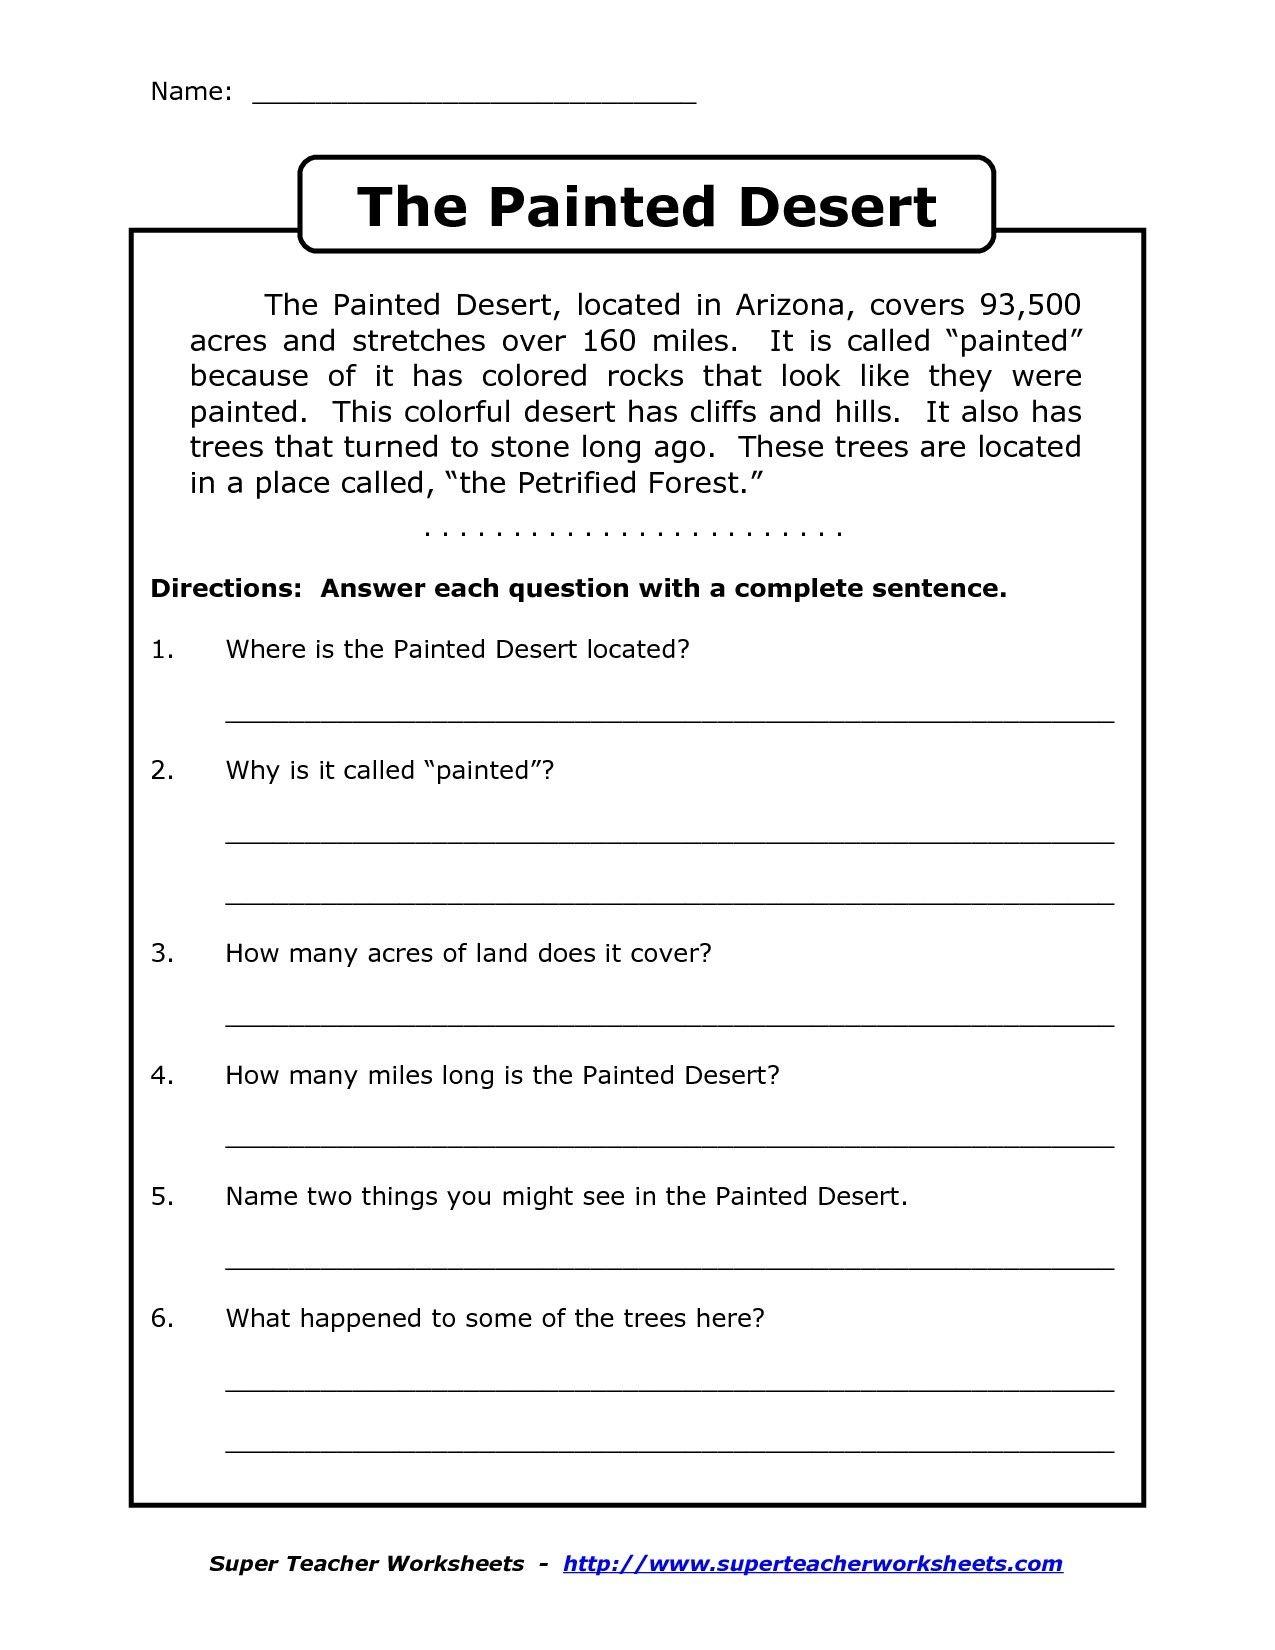 Image Result For Free Printable Worksheets For Grade 4 Comprehension - Free Printable Ela Worksheets